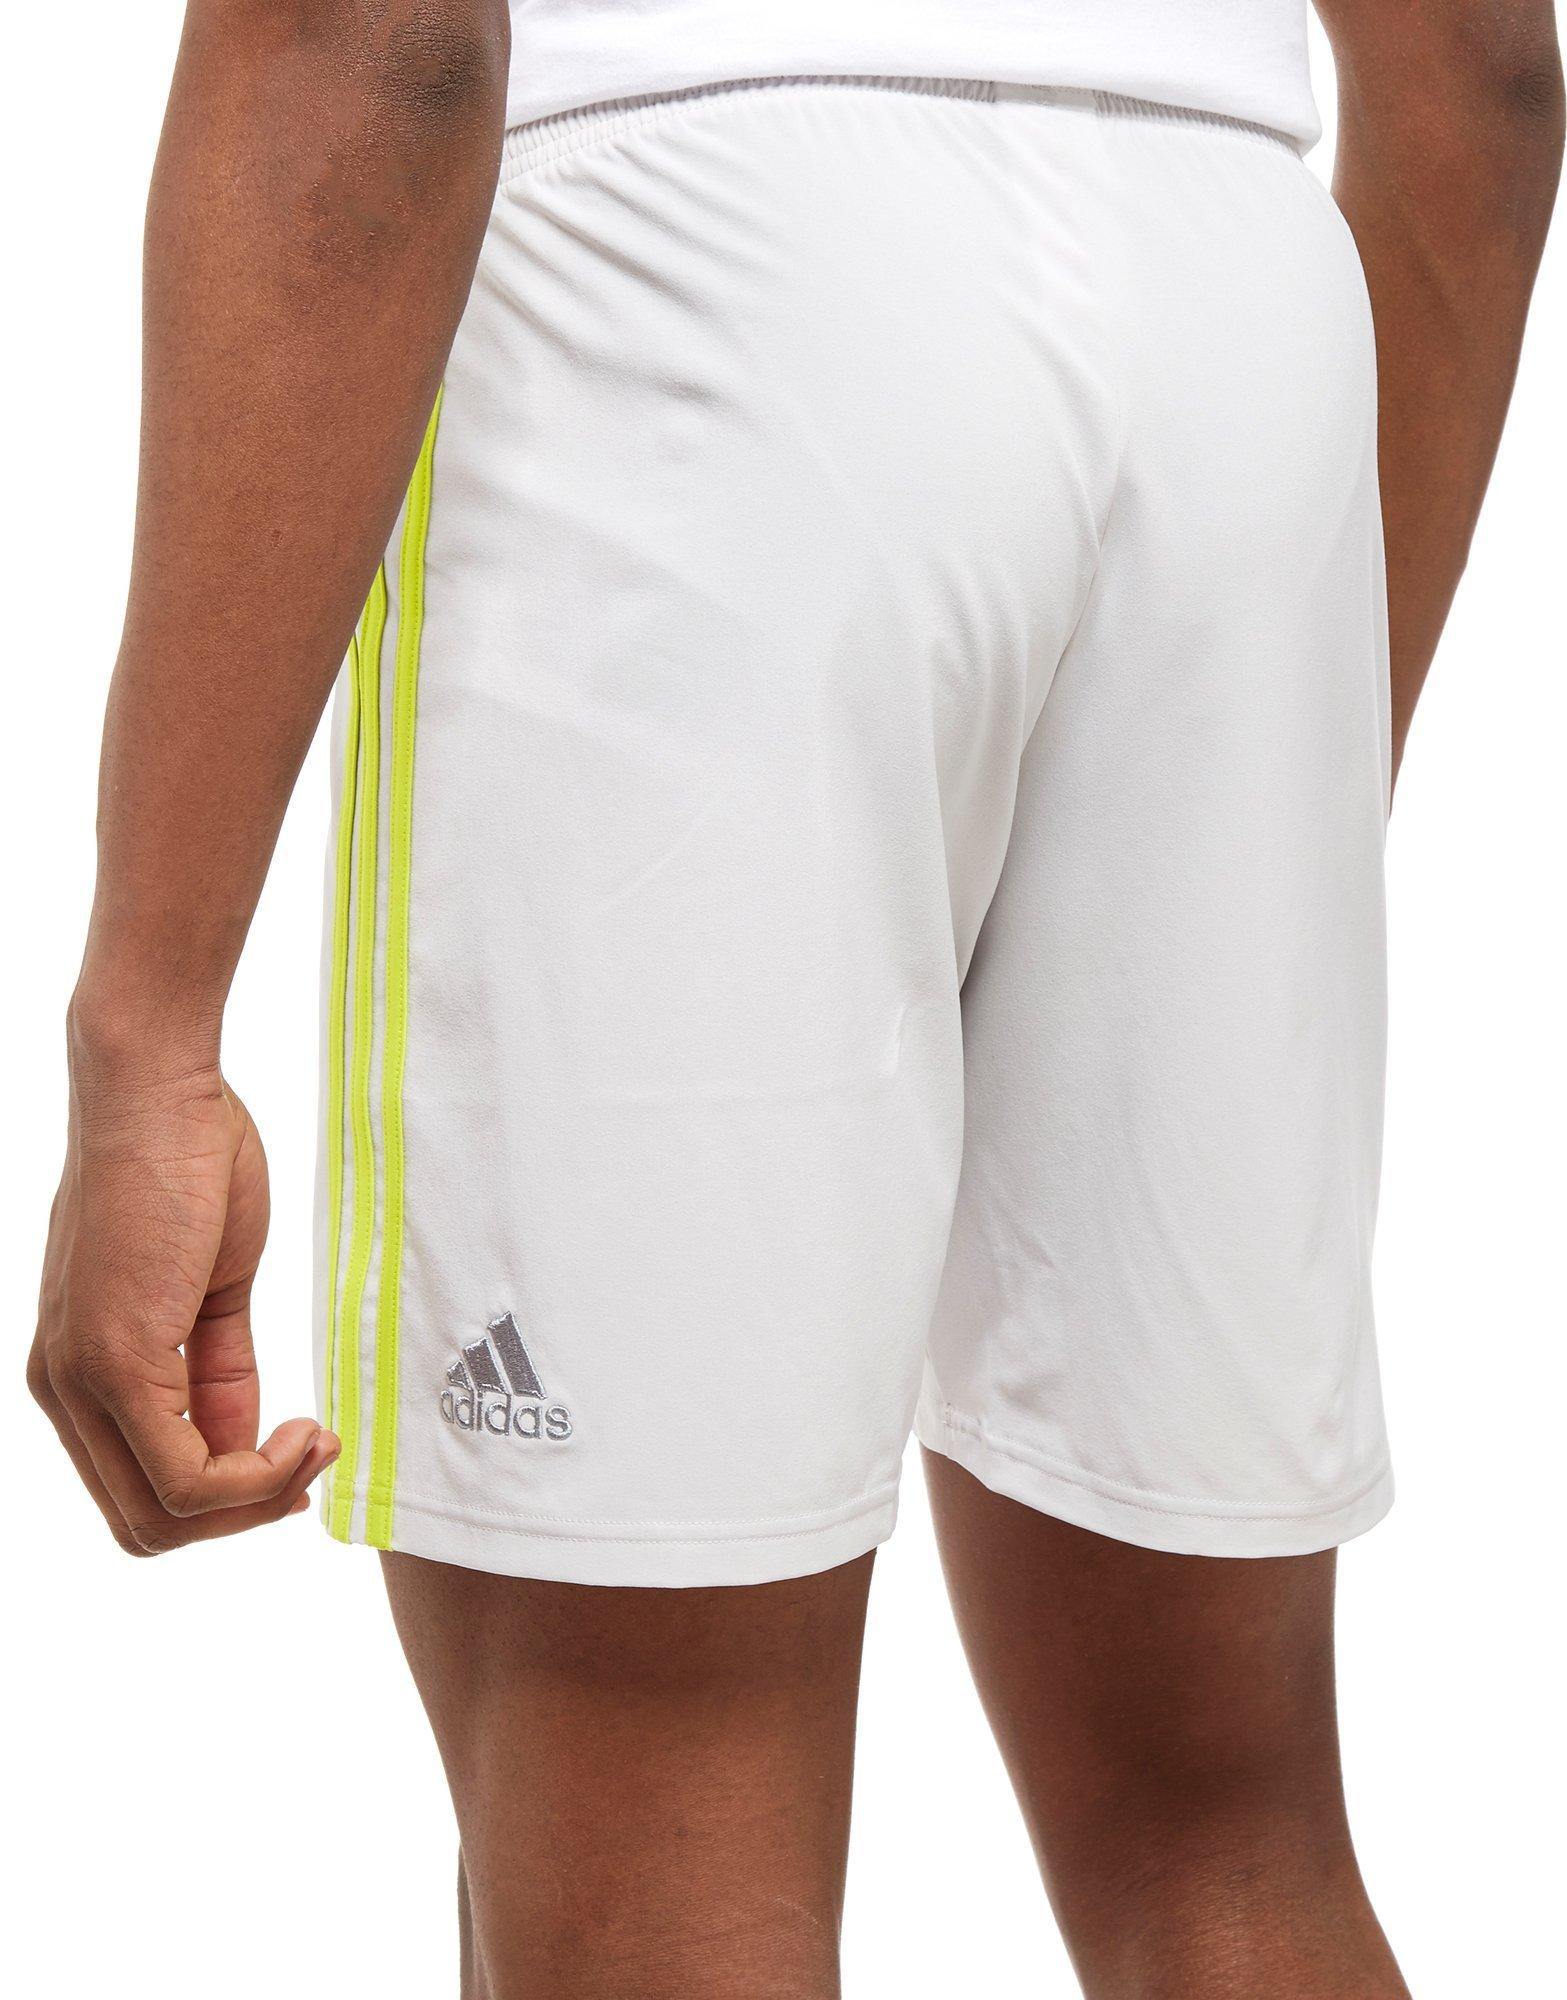 adidas Scotland 2018/19 Home Goalkeeper Shorts